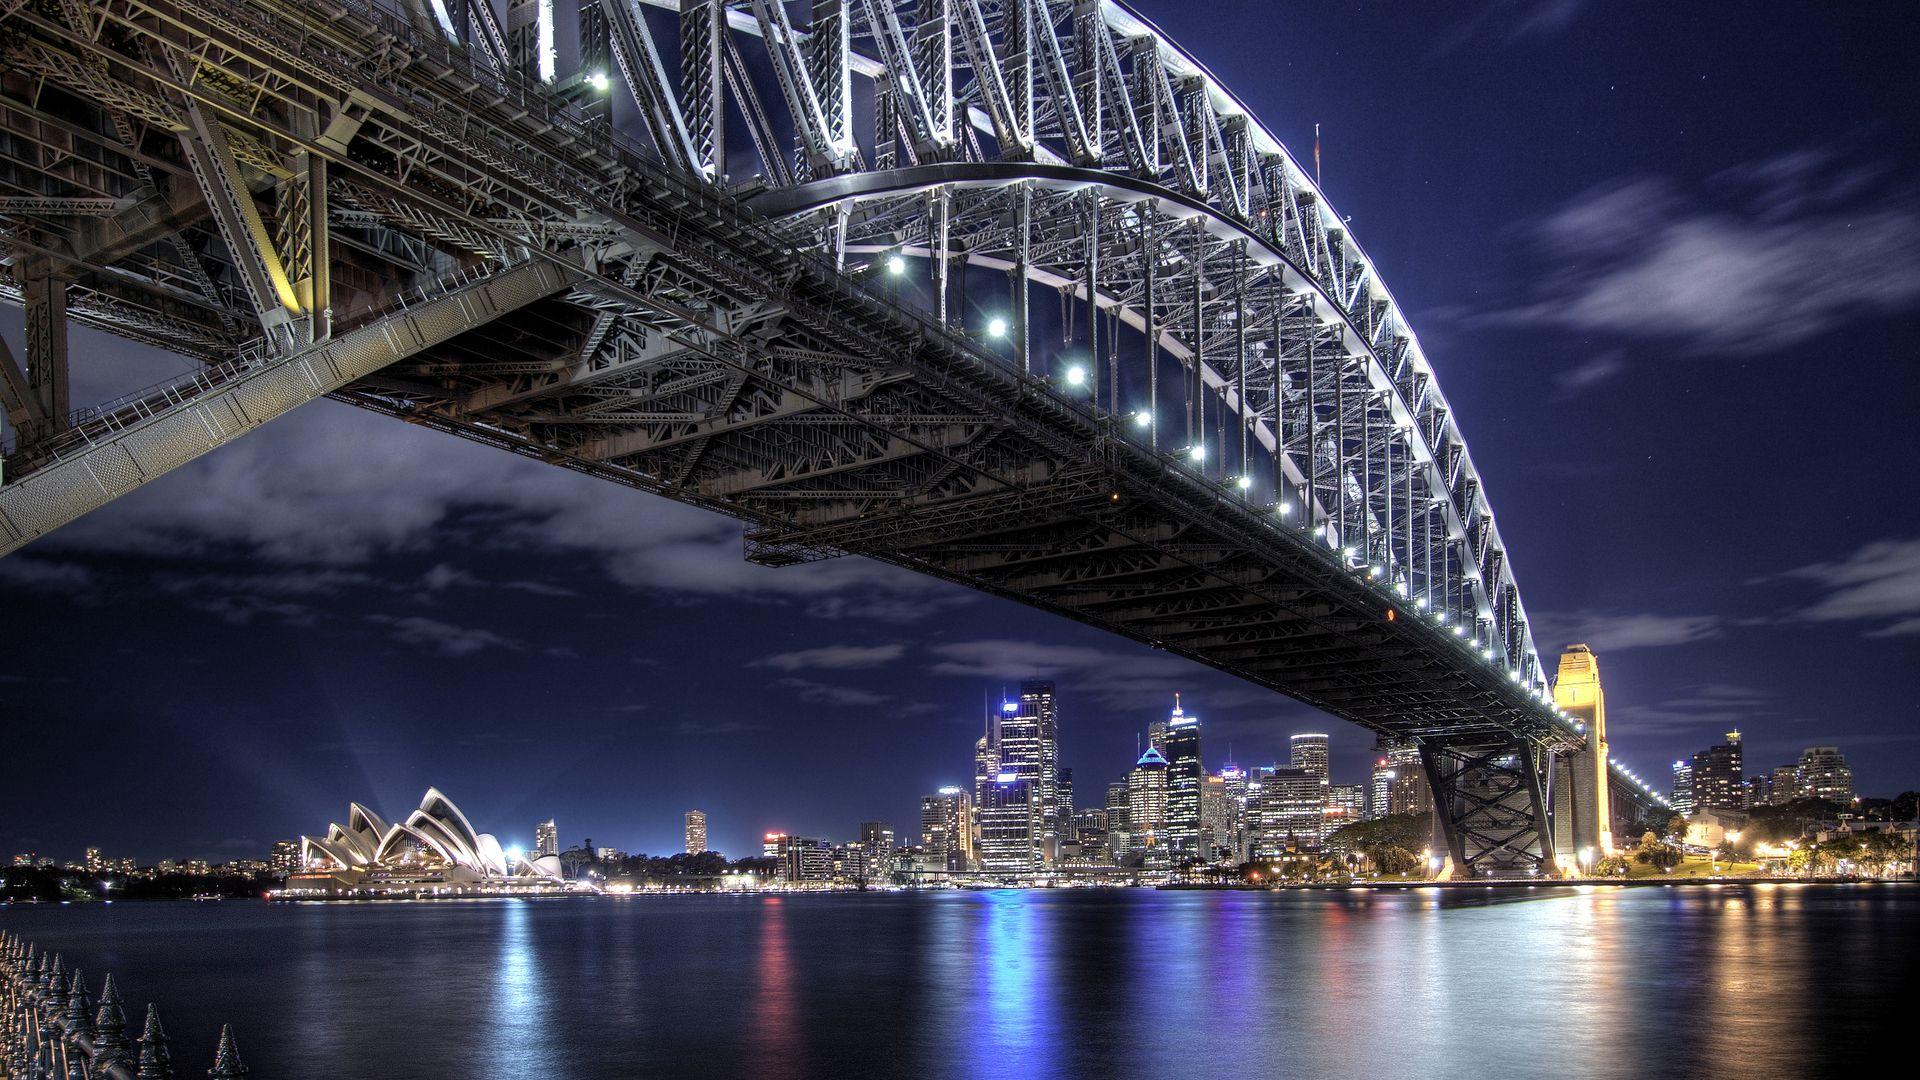 Full Hd 1920x1080 Harbour Bridge Sydney Australia 1920x1080